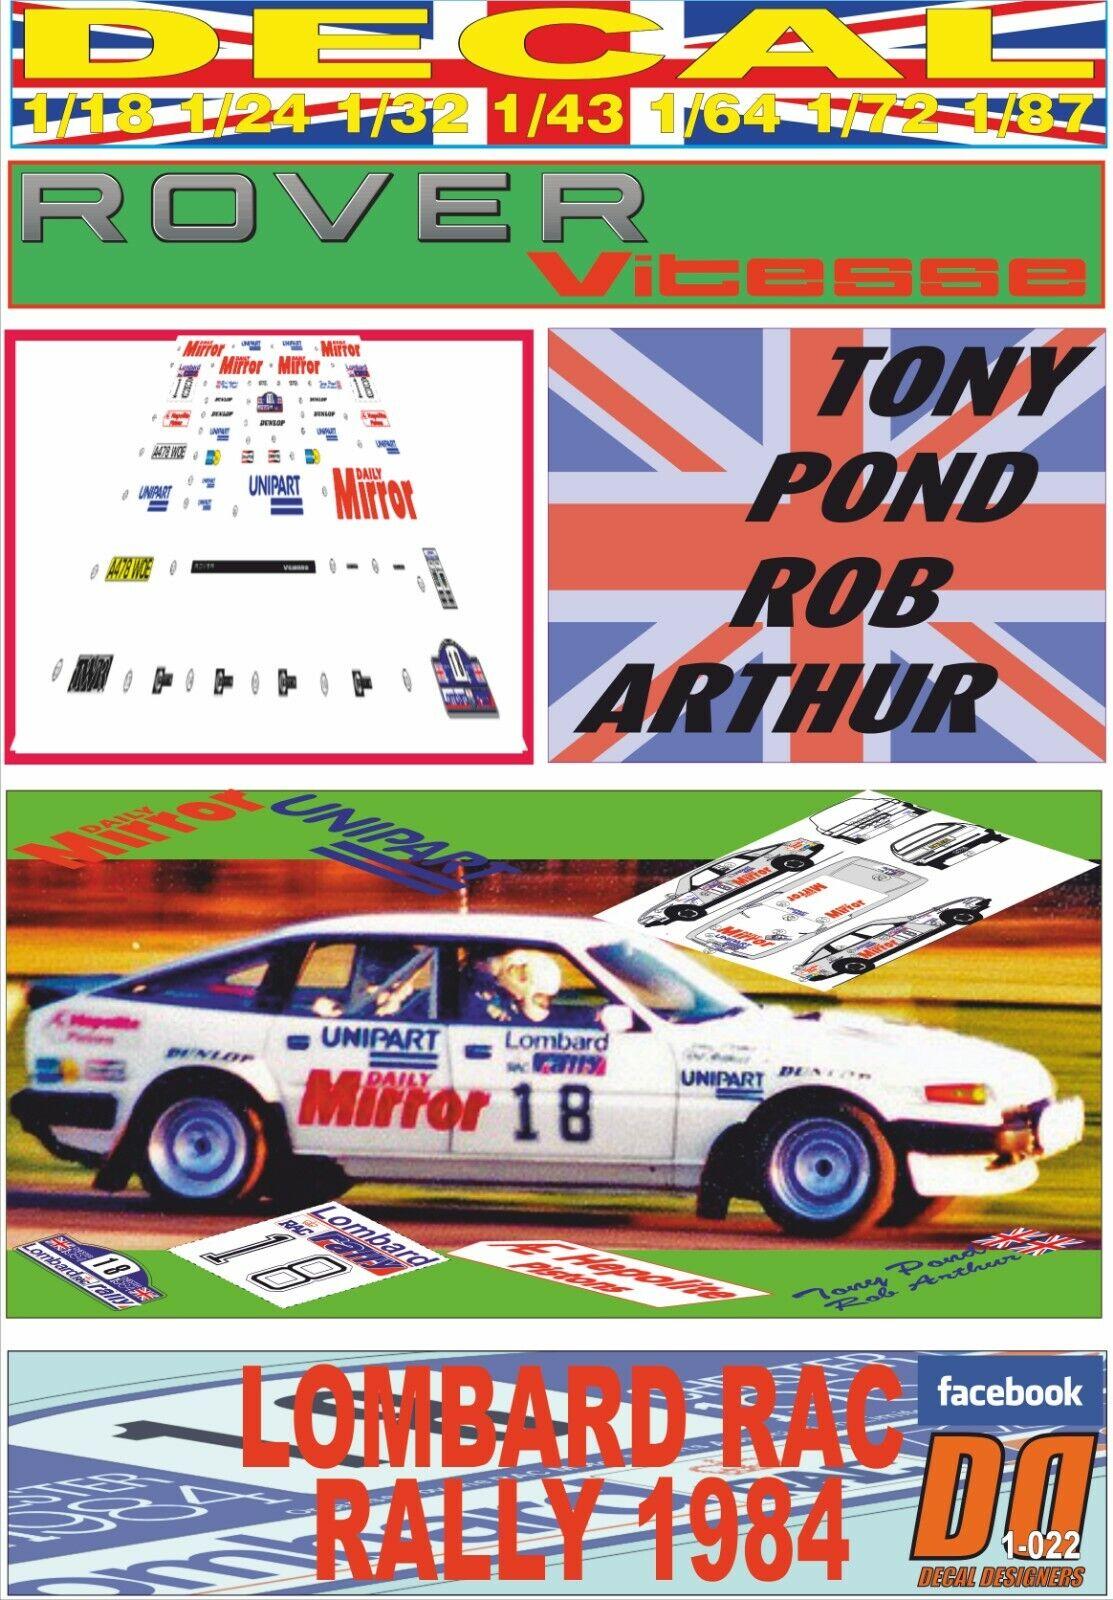 DECAL ROVER SD1 VITESSE TONY POND RAC RALLY 1984 DnF (06)